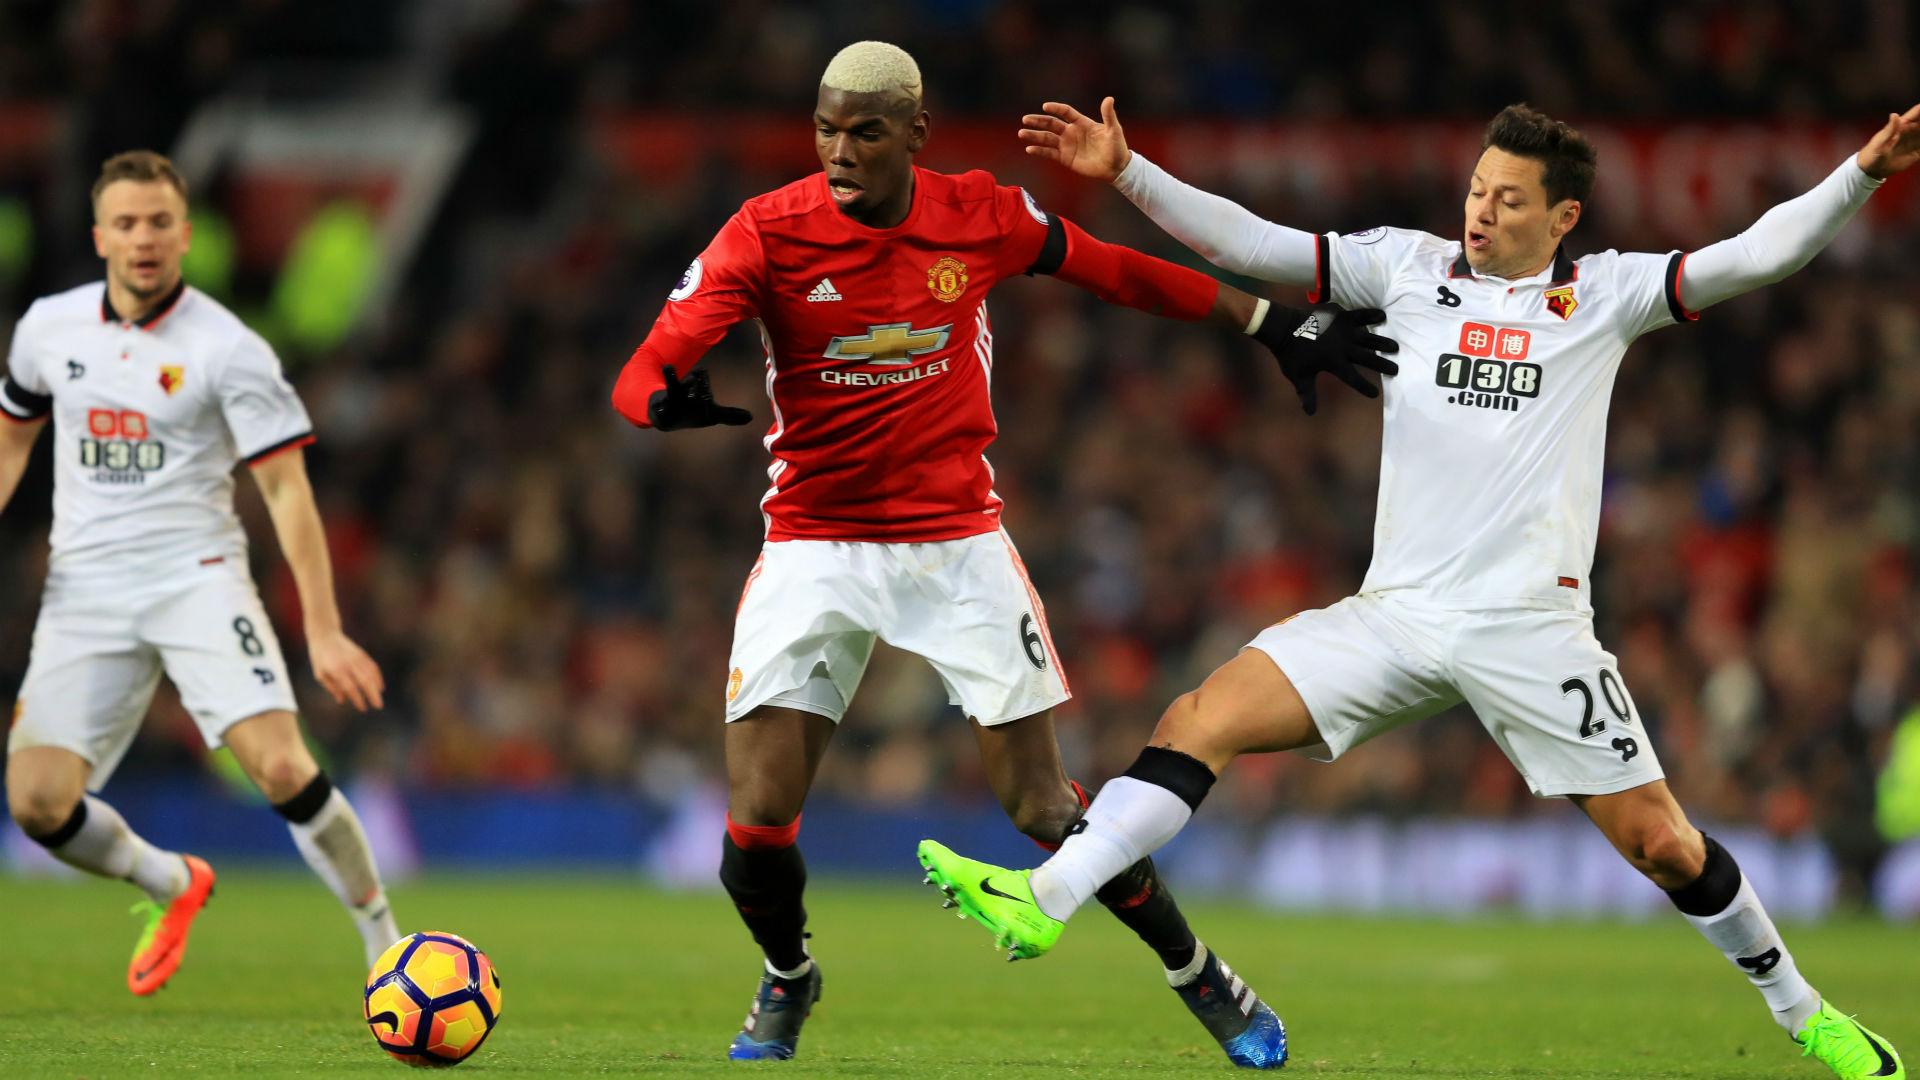 Manchester United Watford Pogba